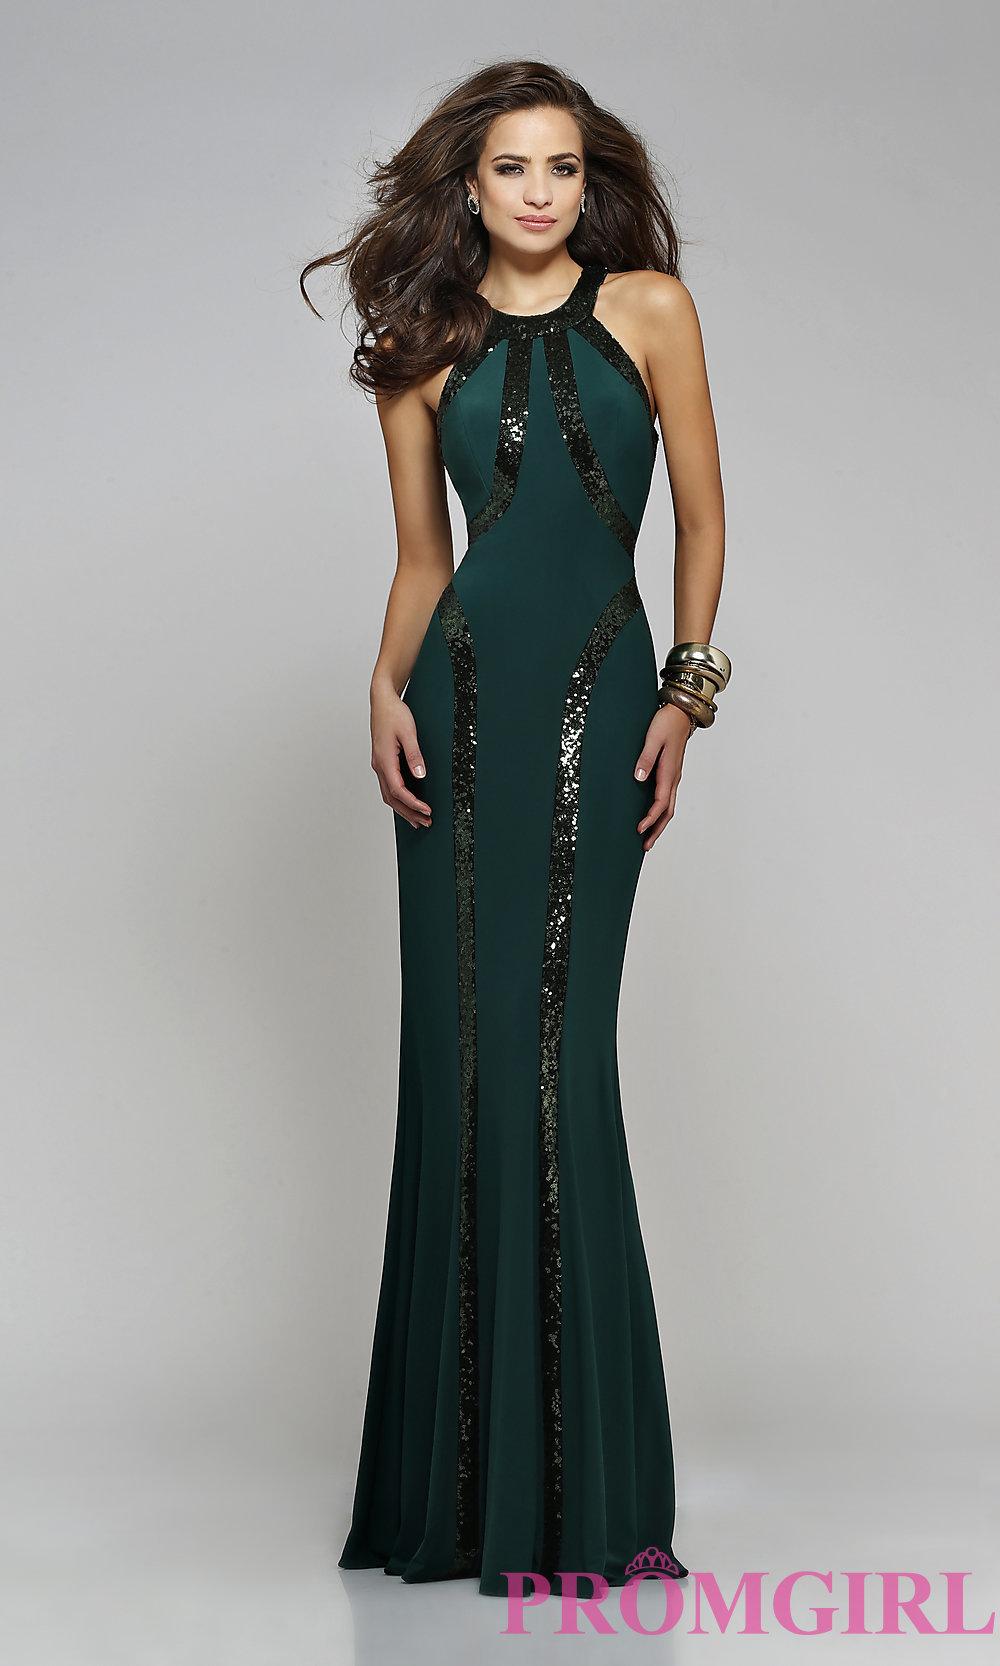 evening dresses designer photo - 1